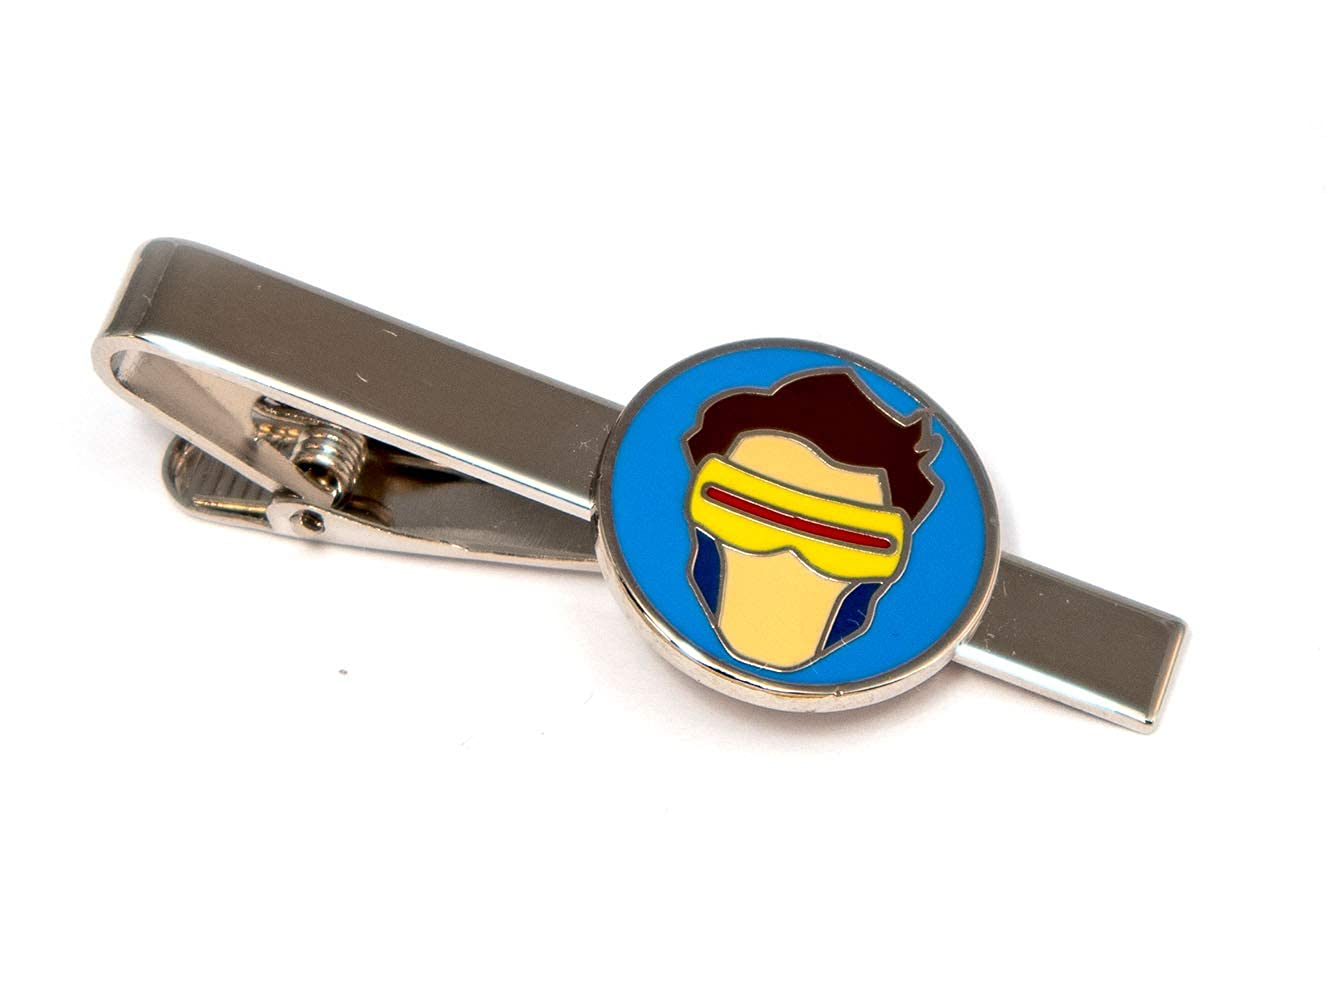 SharedImagination Cyclops Cufflinks Wolverine Cuff Links Link Deadpool Tie Tack Groomsmen Wedding Party Gift Marvel Minimalist Jewelry The X-Men Tie Clip